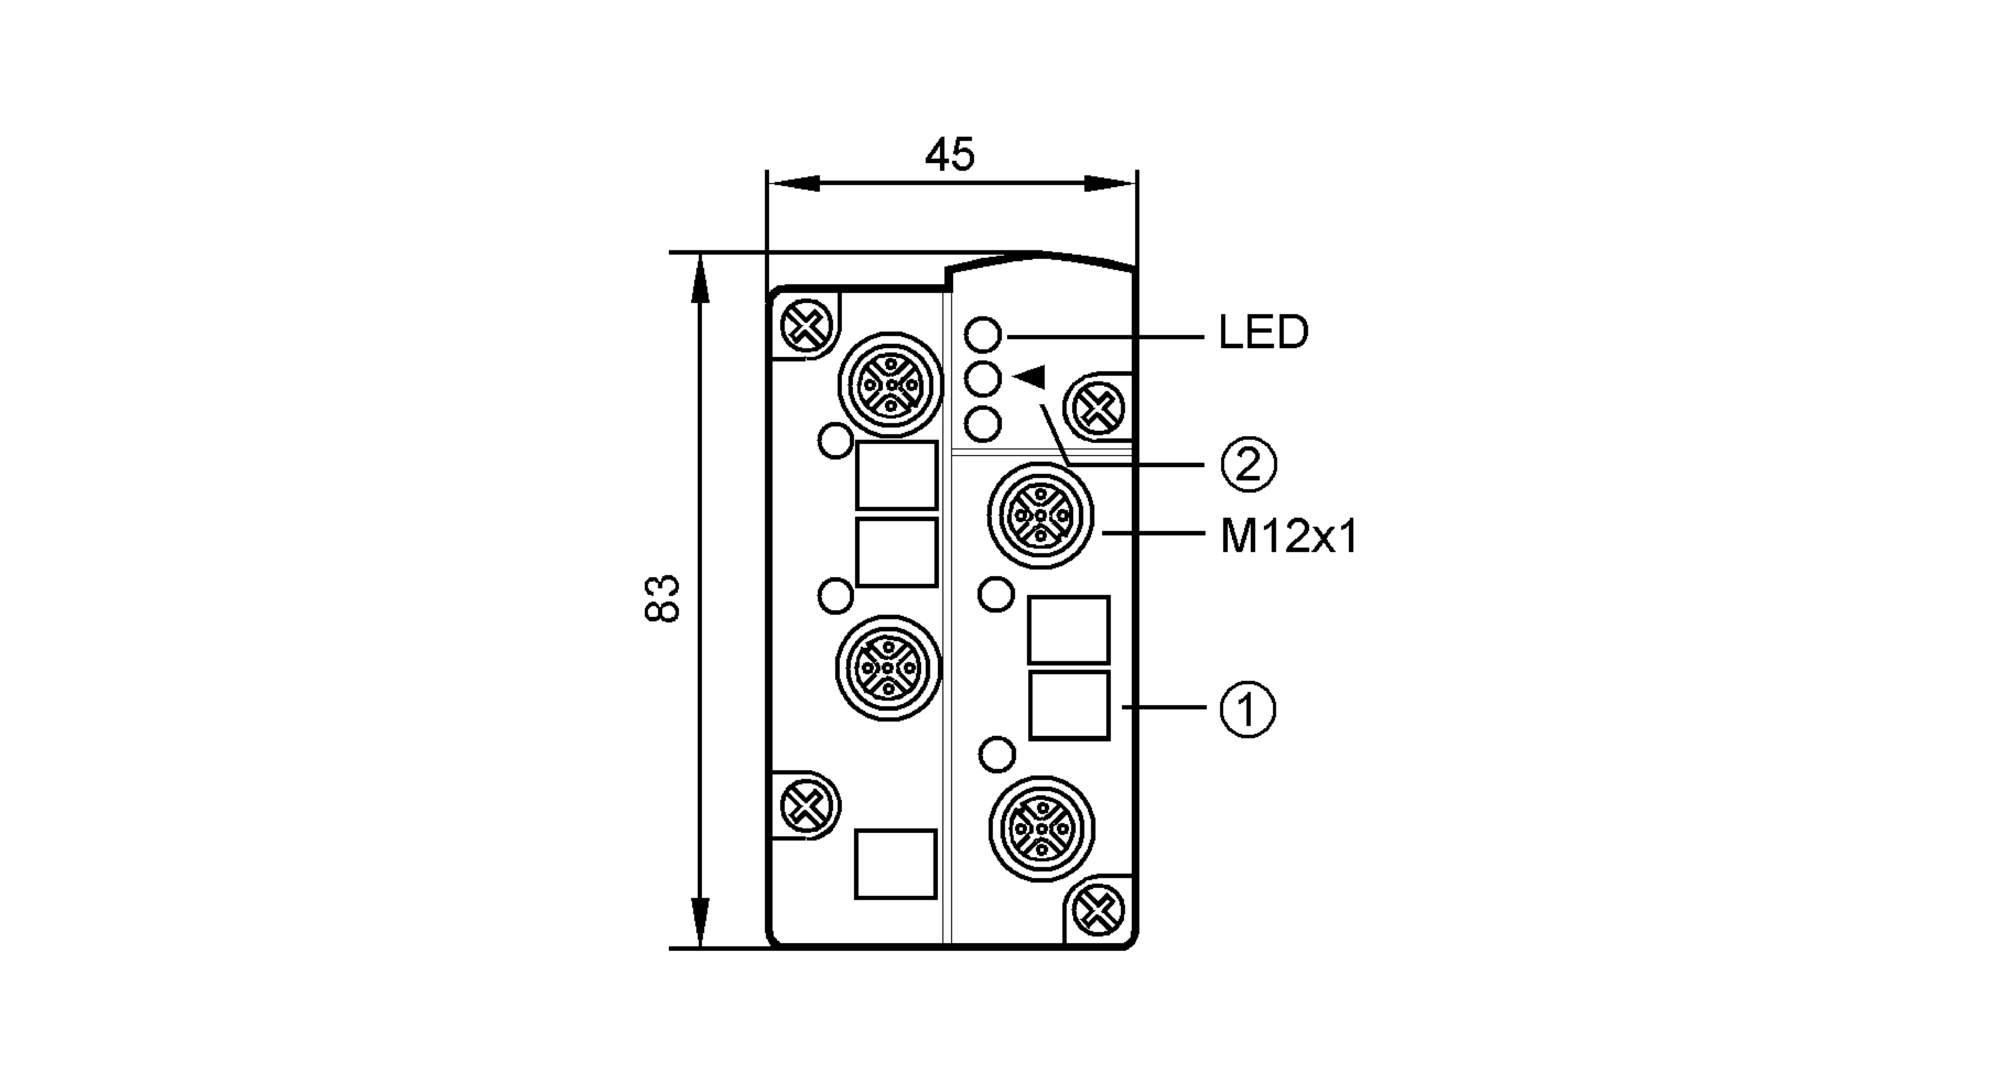 ac2505 - as-interface classicline module